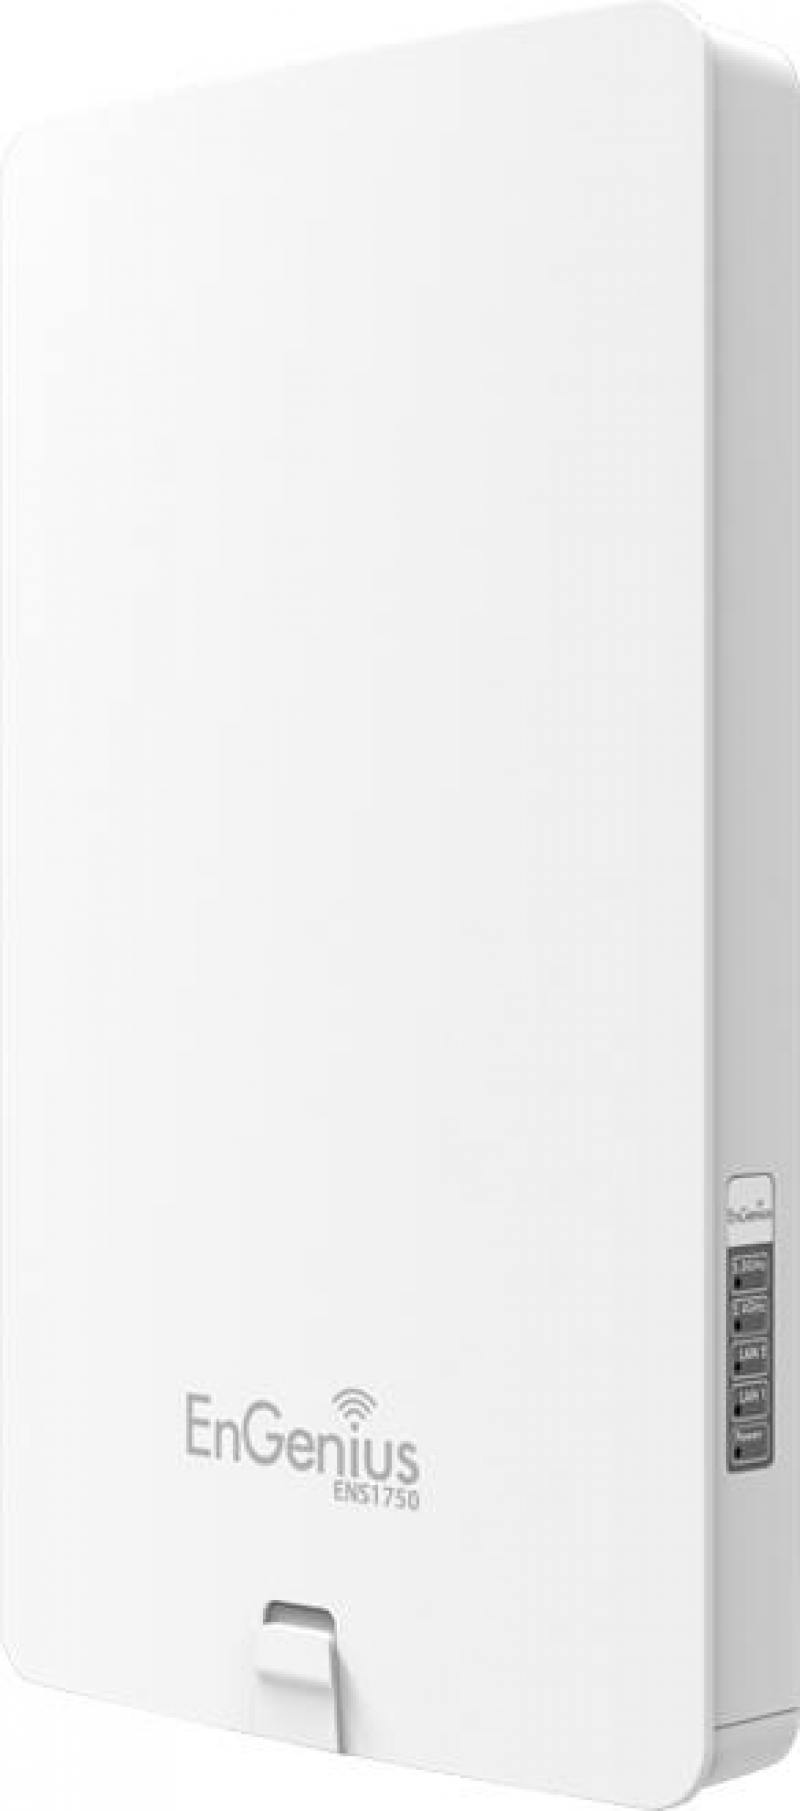 Точка доступа EnGenius ENS1750 802.11aс 1300Mbps 5 ГГц 2.4 ГГц 2xLAN белый